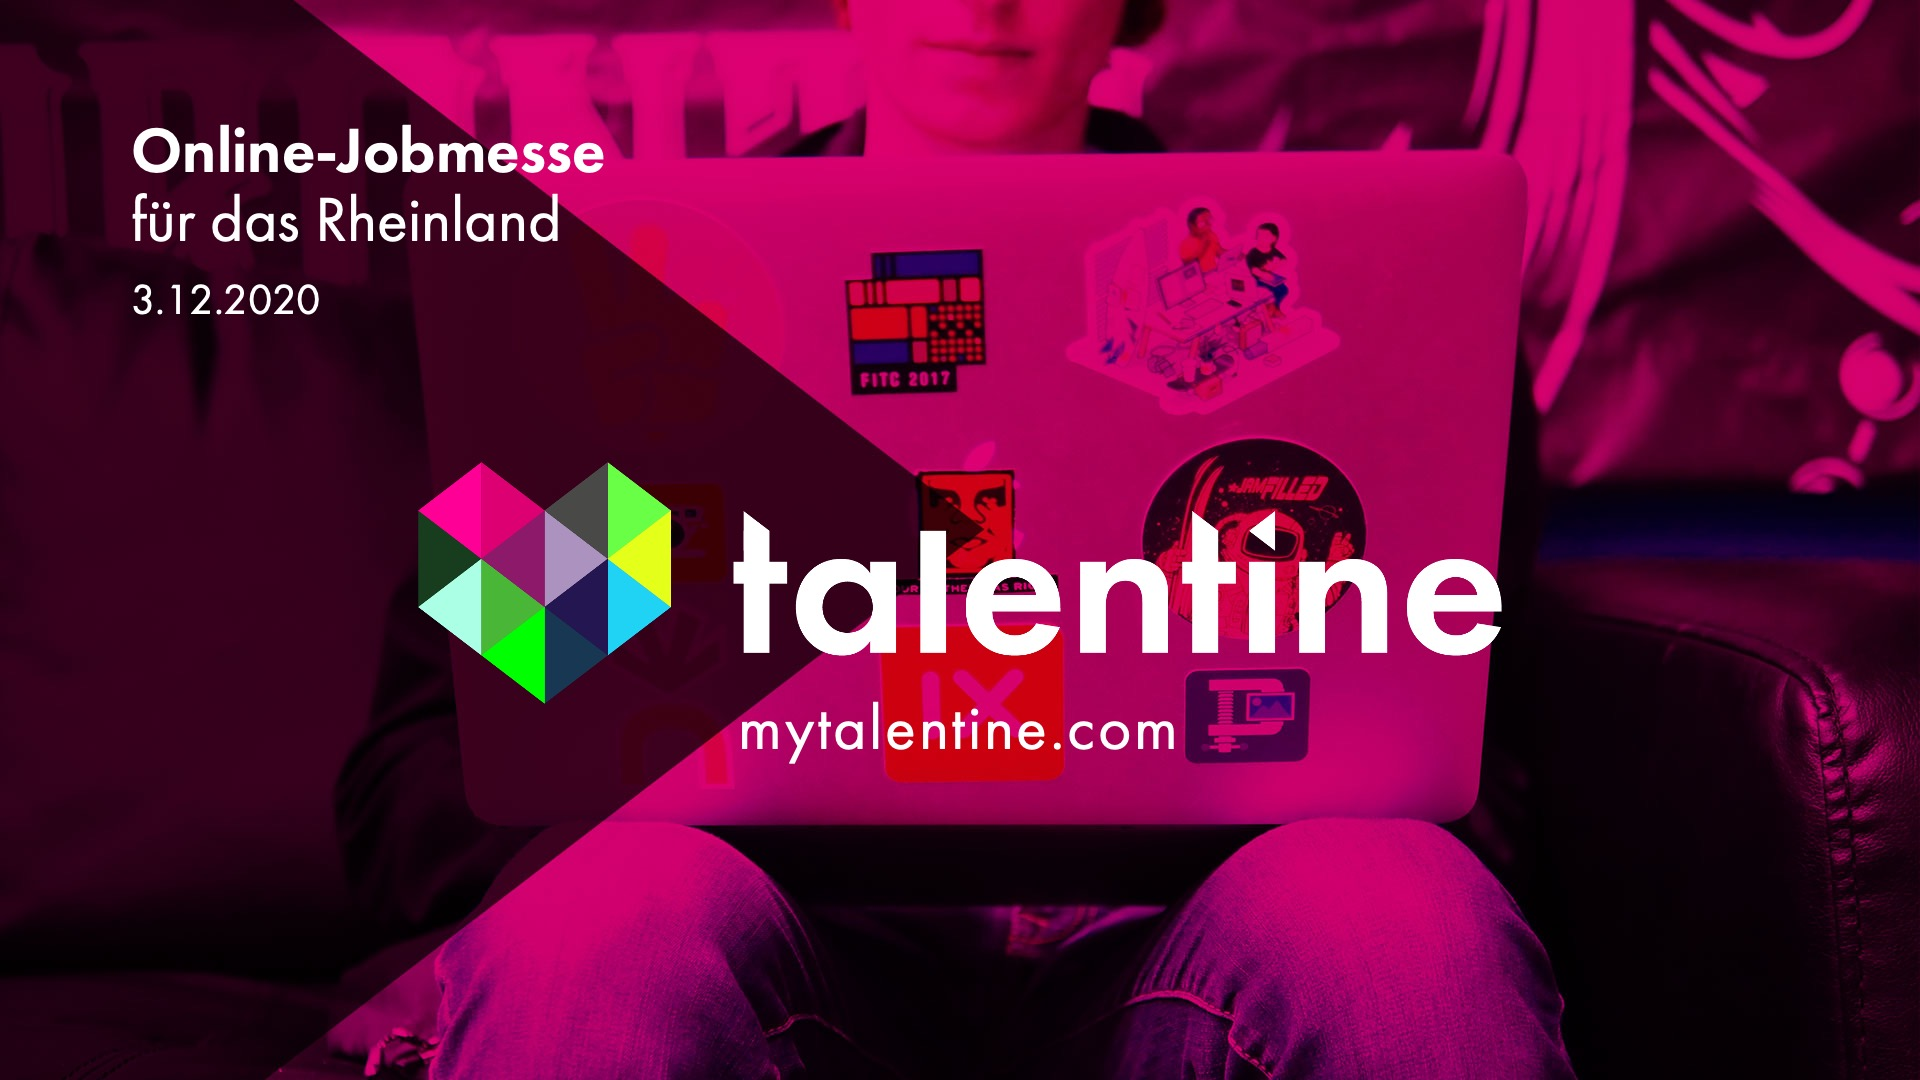 talentine Online-Jobmesse